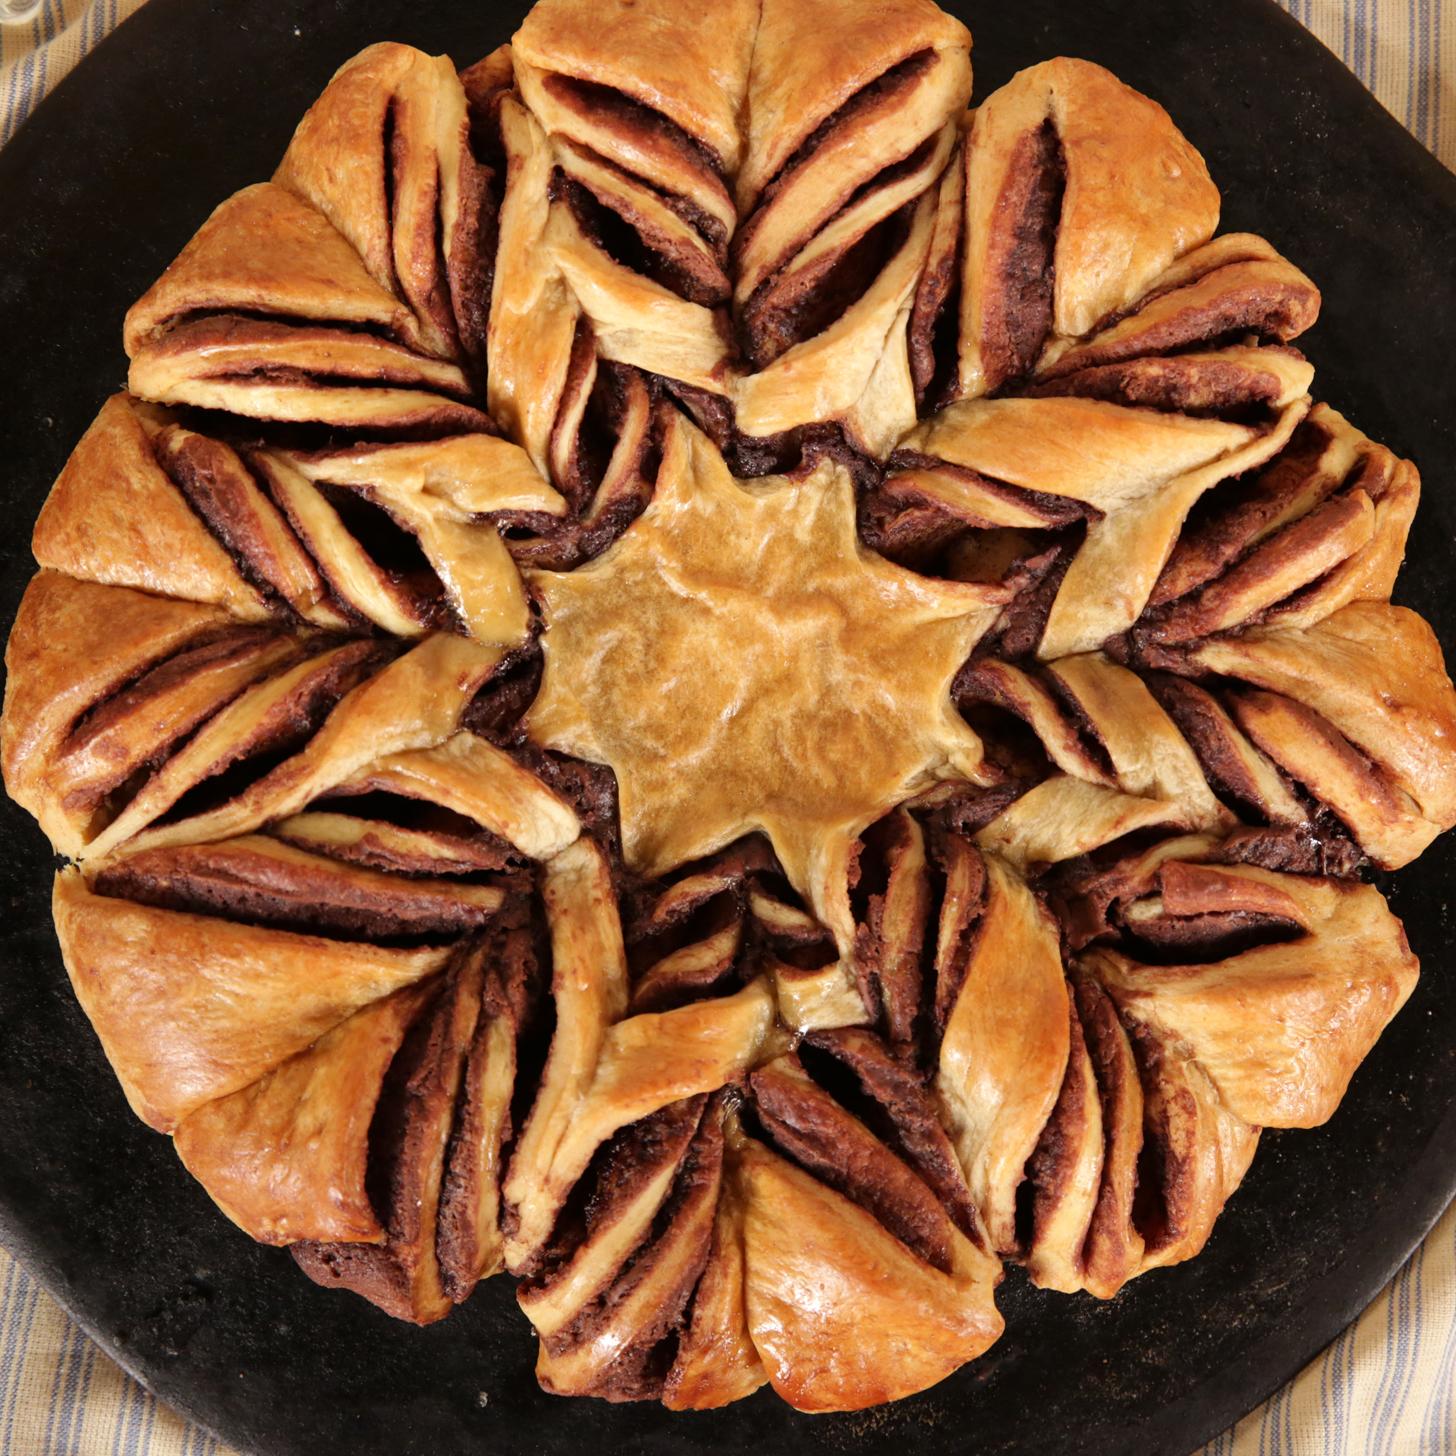 Braided Nutella Croissant Bread | POPSUGAR Food